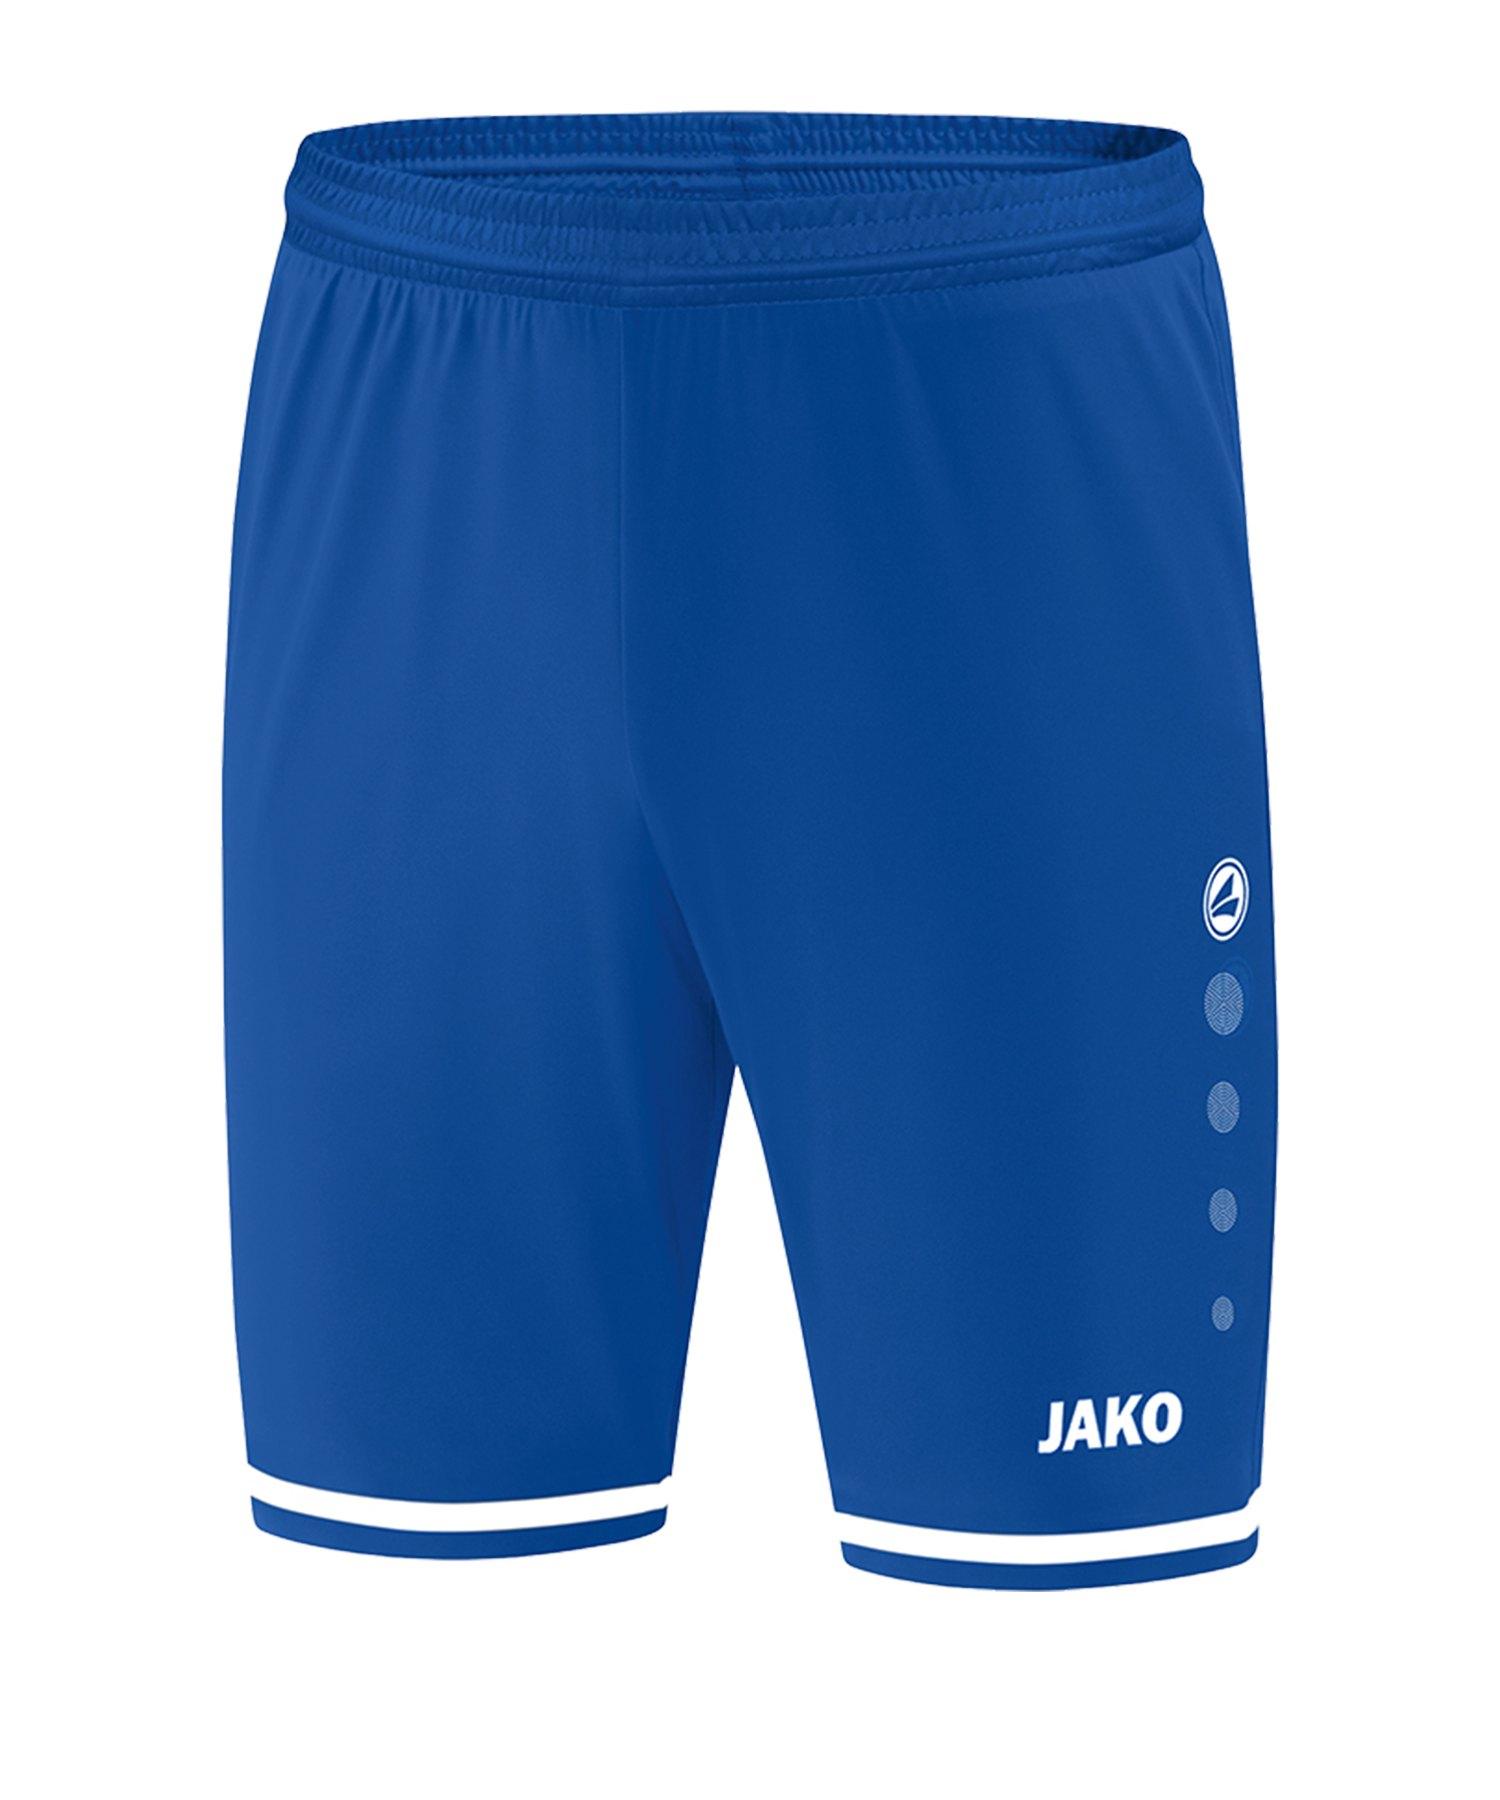 Jako Striker 2.0 Short Hose kurz Kids Blau F04 - Blau